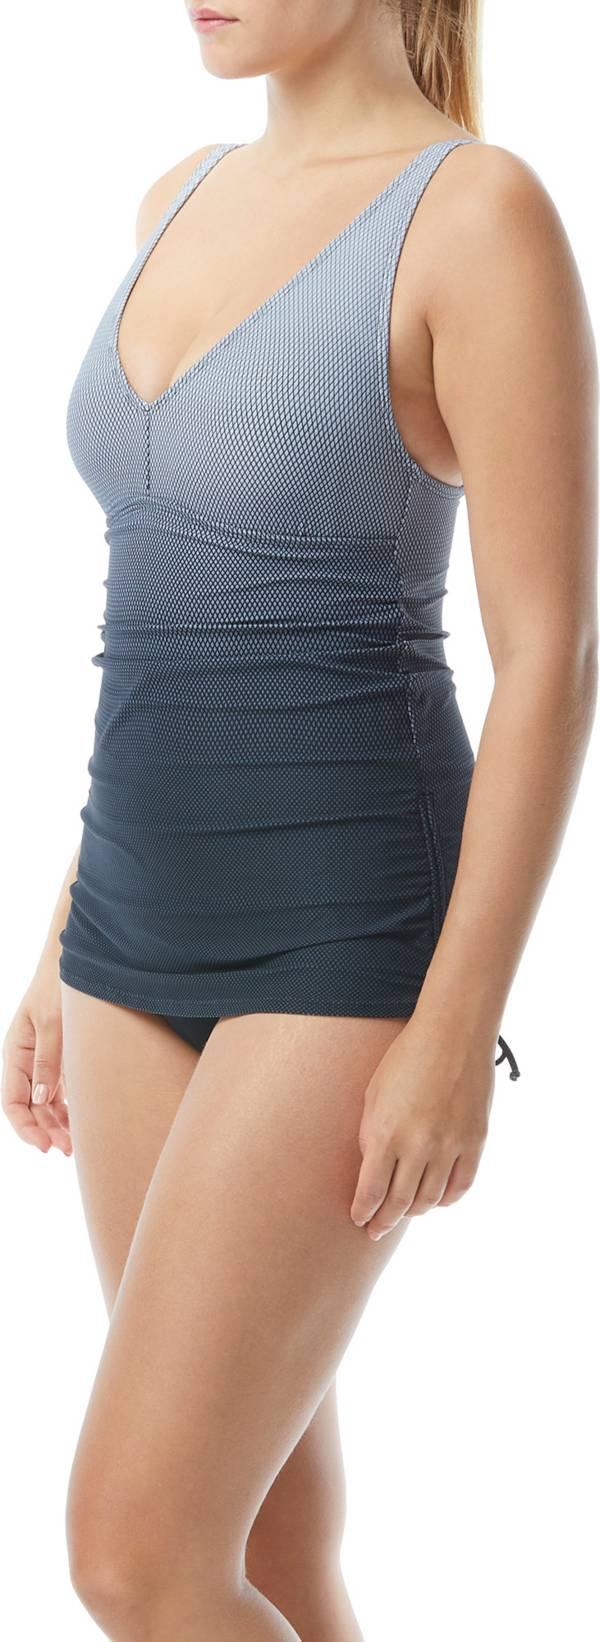 TYR Women's Fishnet V-Neck Sheath Swim Shirt product image